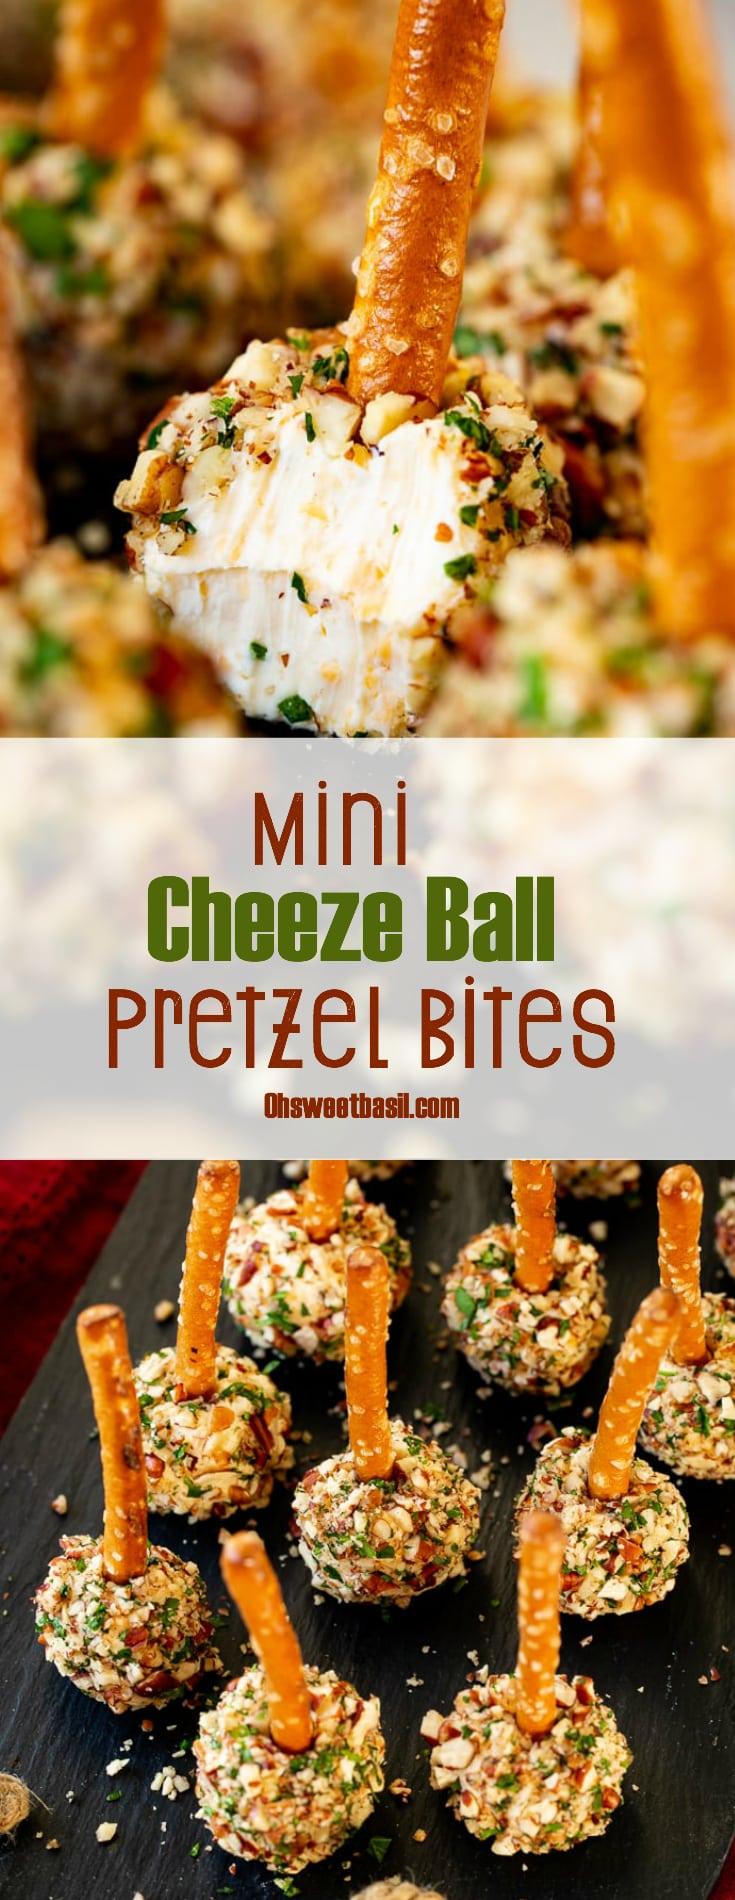 mini cheese ball bites with pretzel sticks